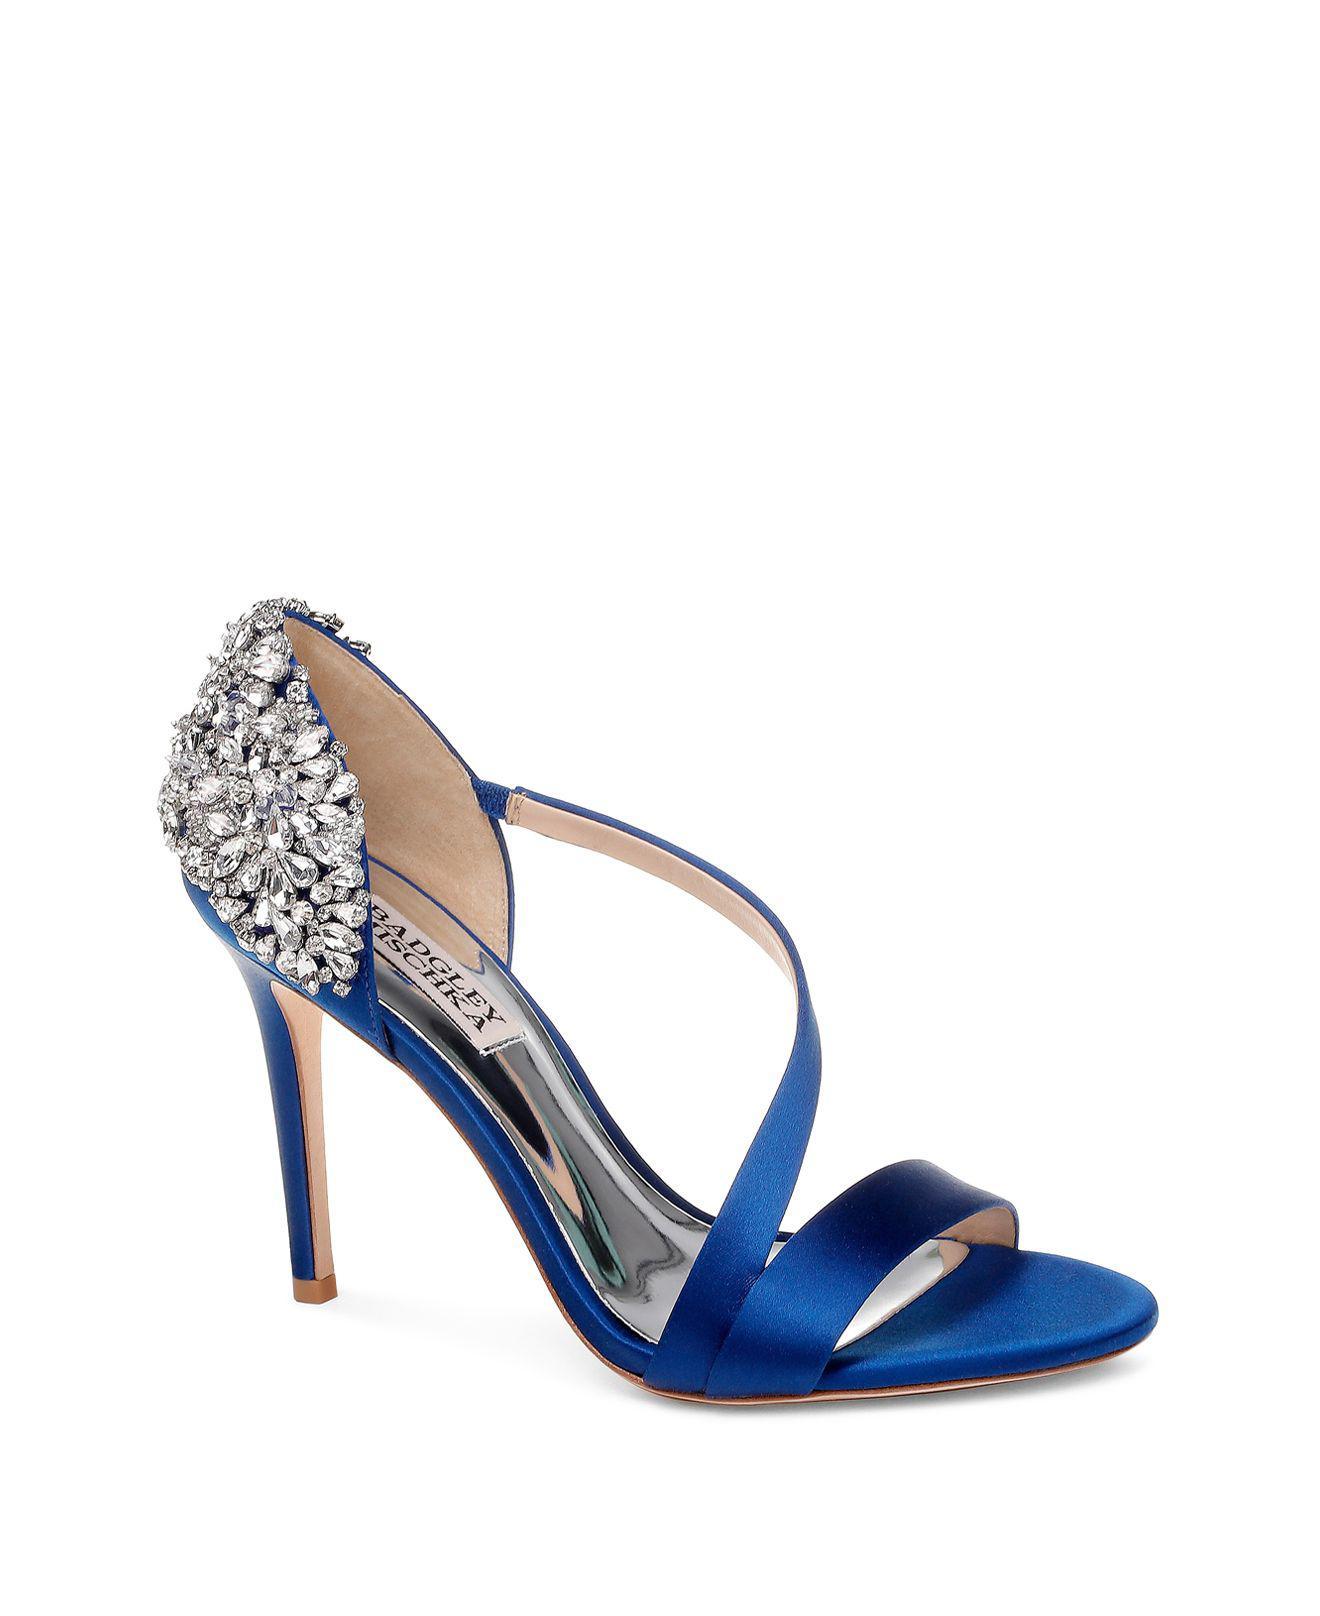 Badgley Mischka Women's Pauline Embellished Satin Crossover High-Heel Sandals CtkF37Ve